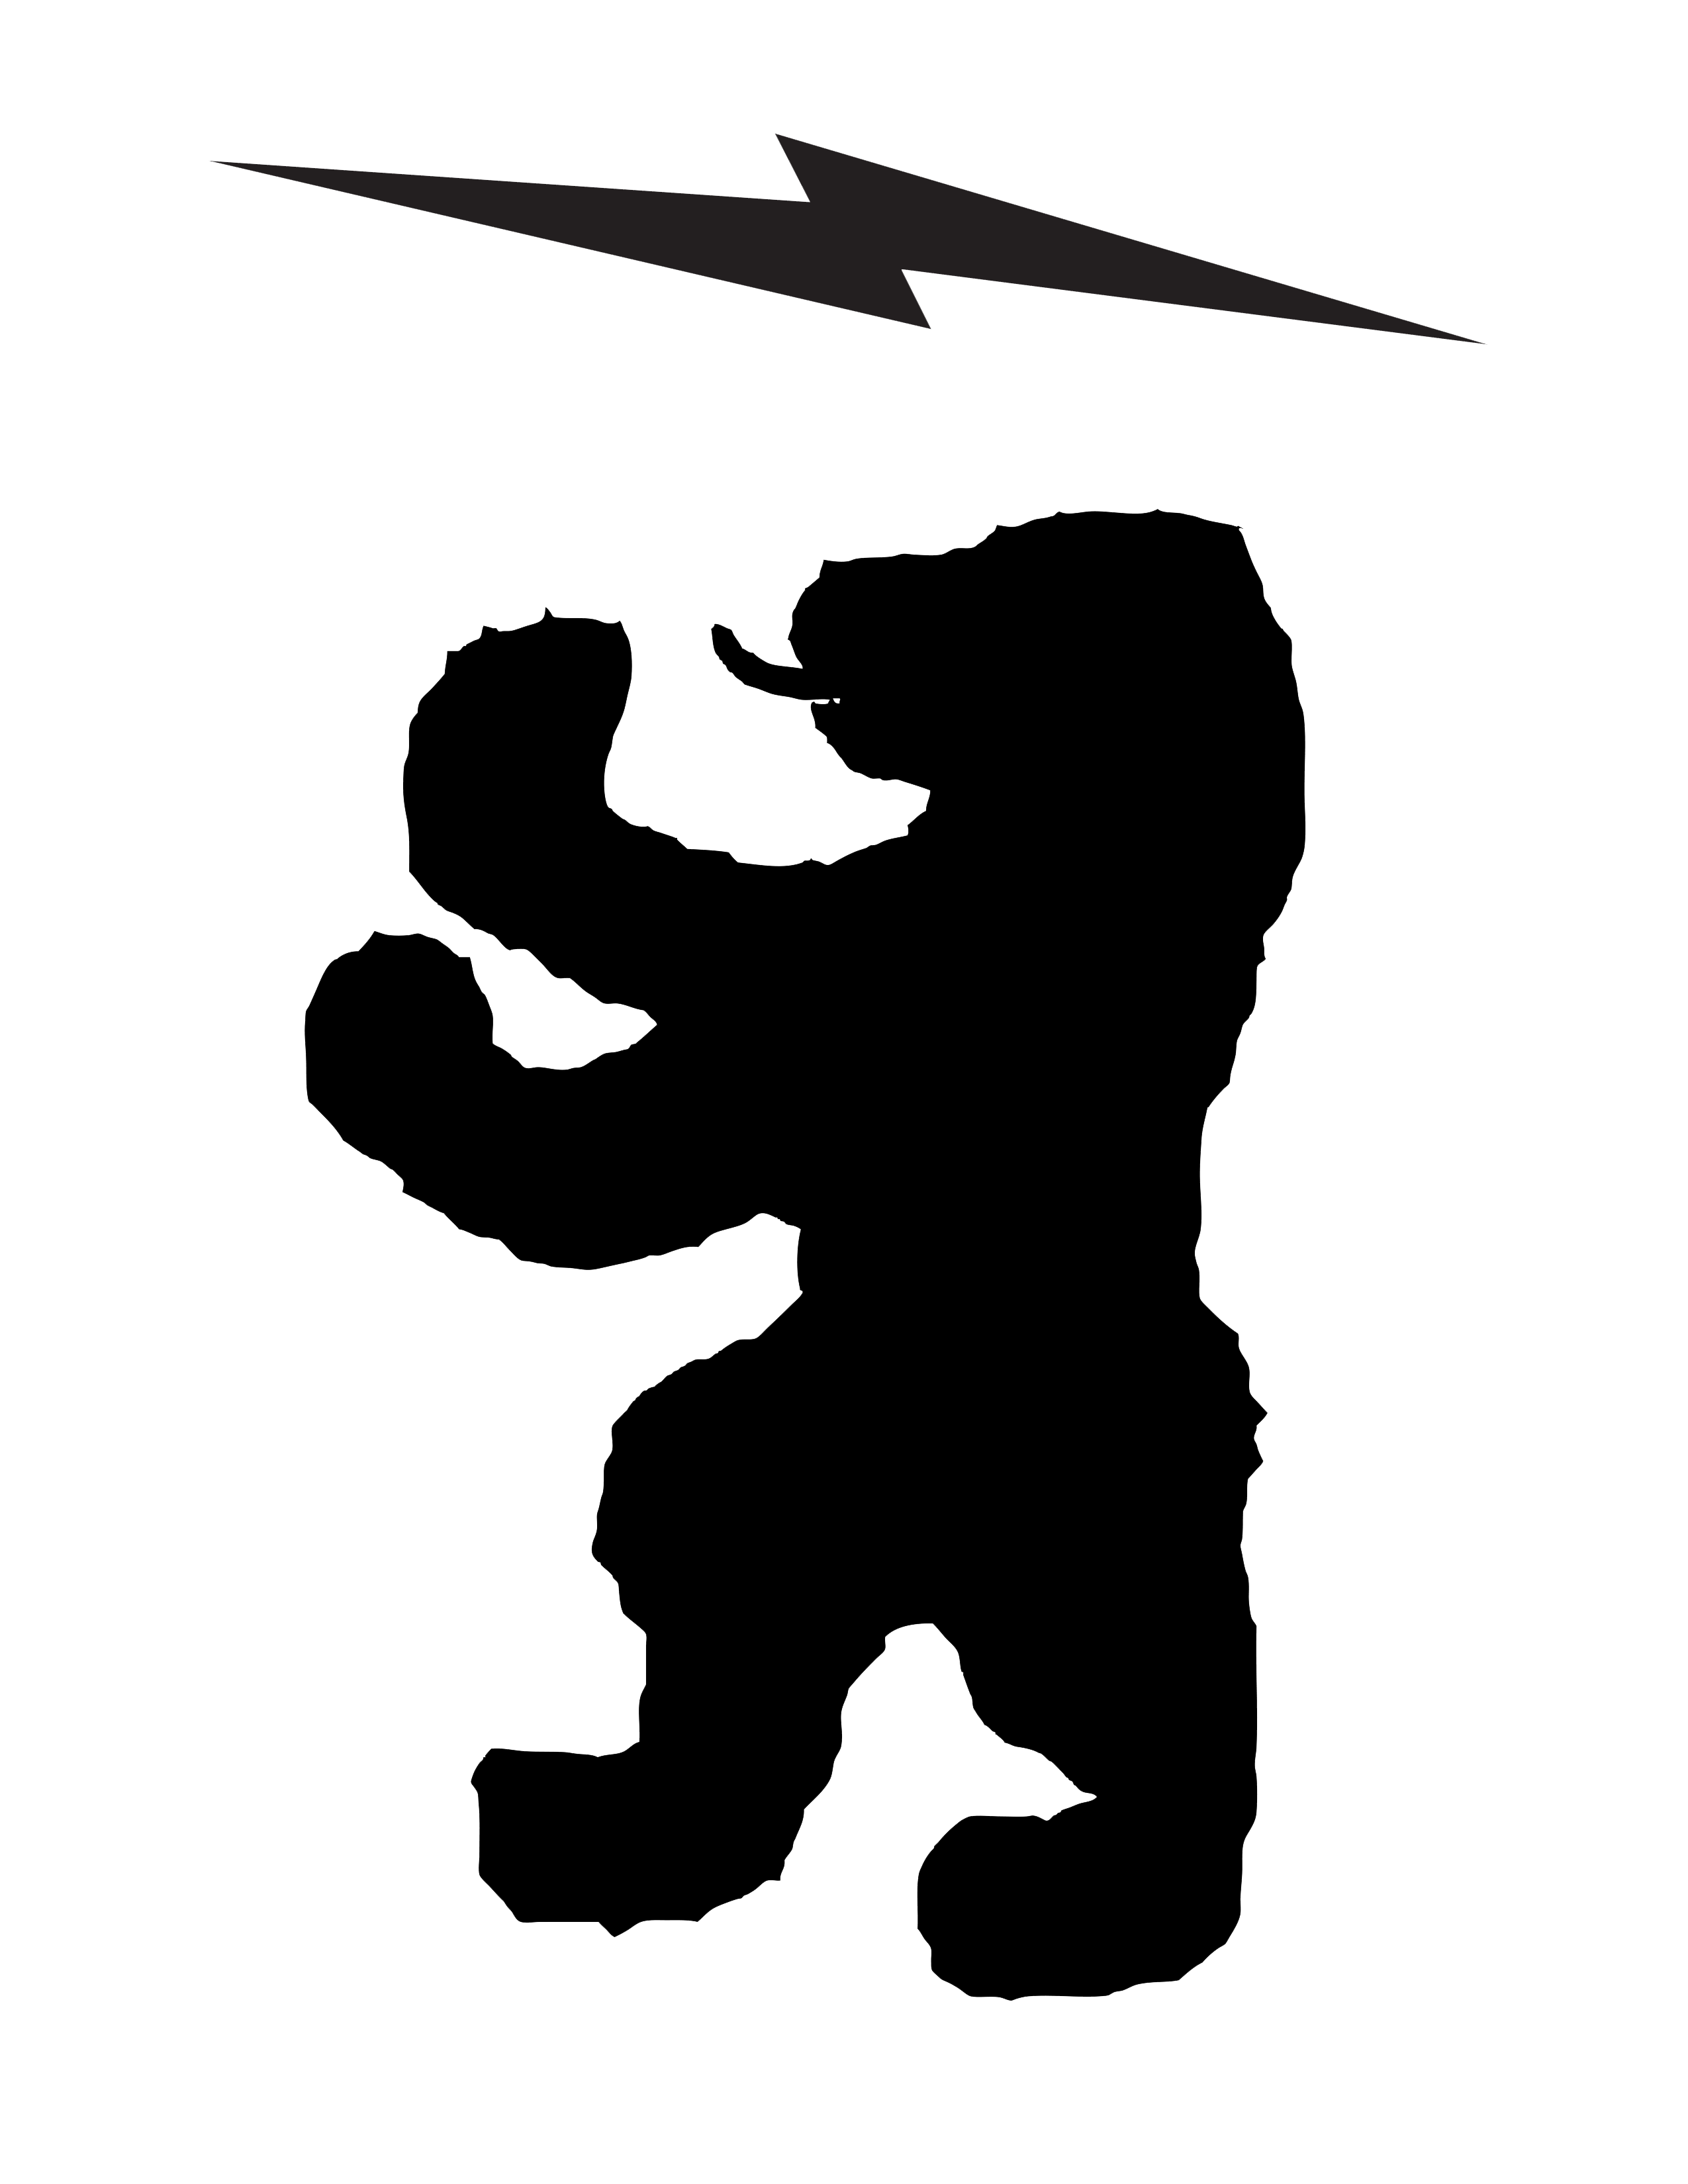 Thorbjørn Andersen logo